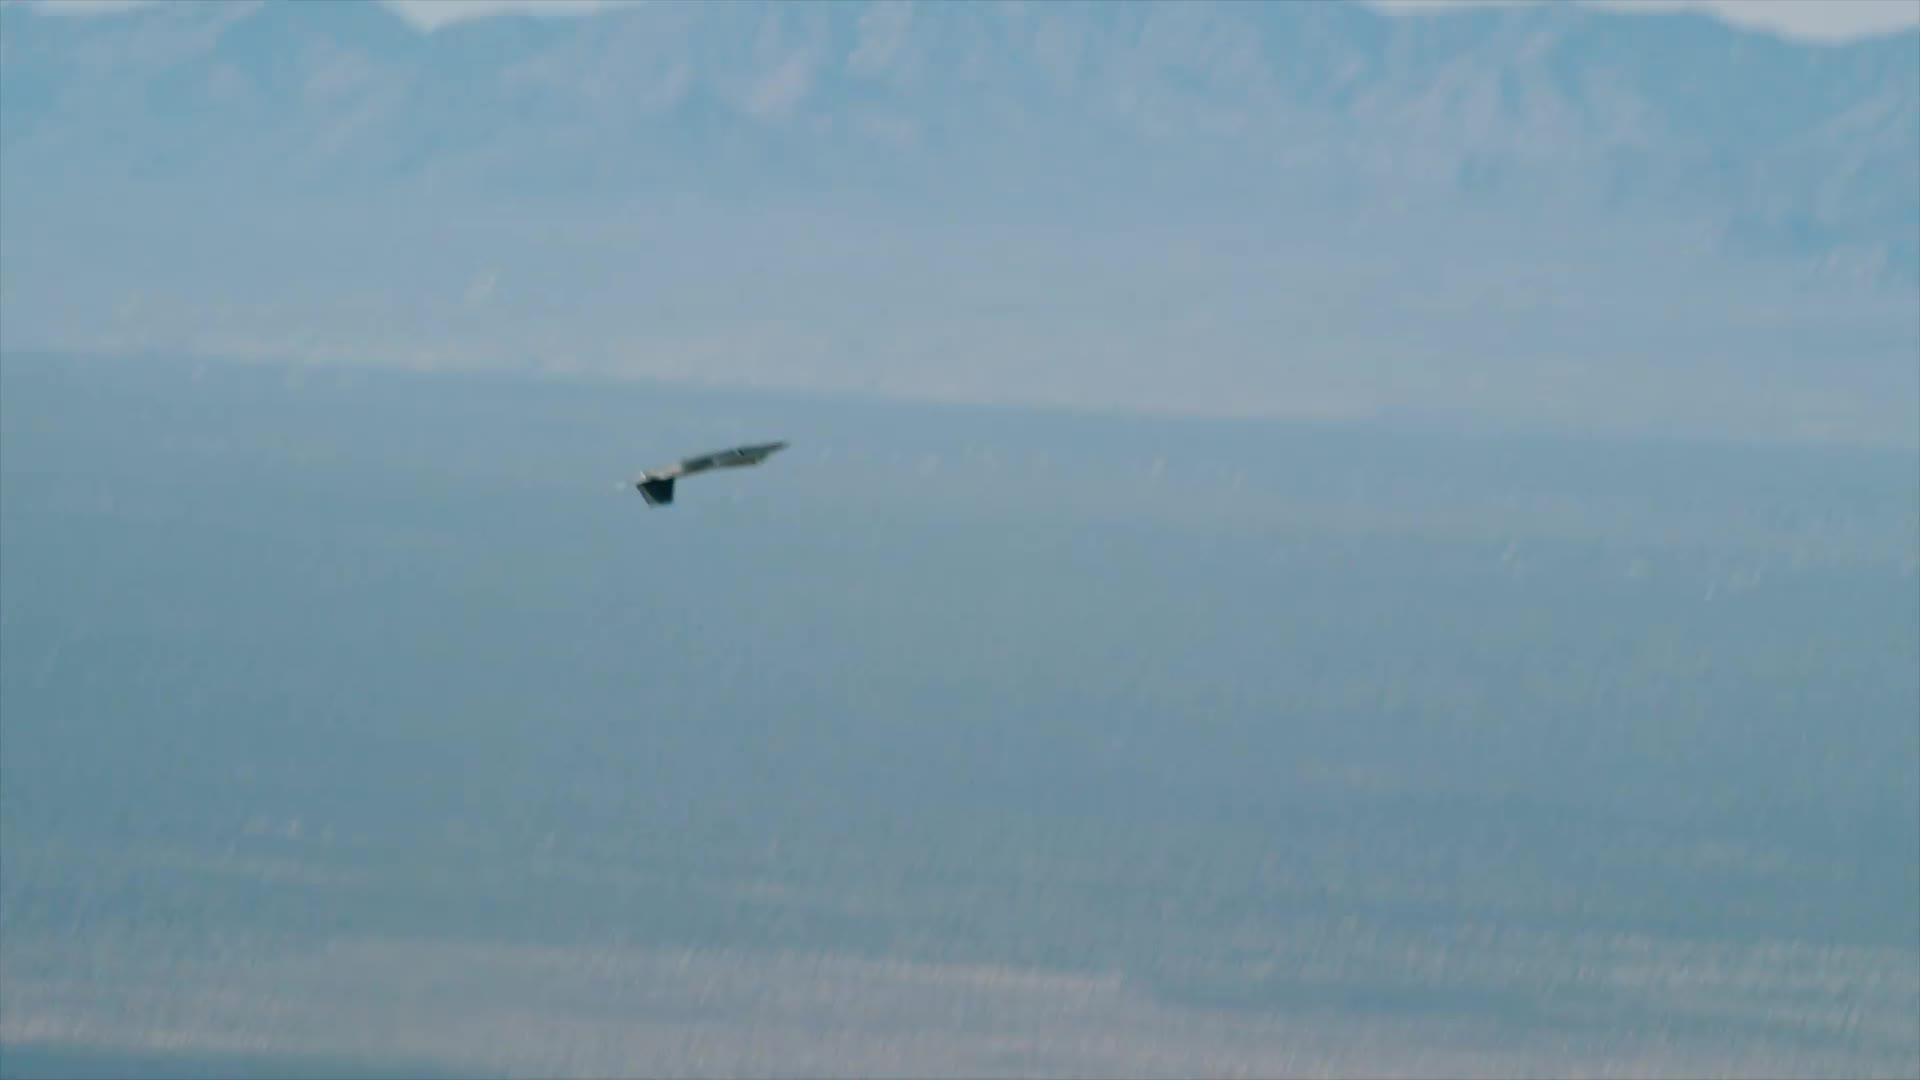 militarygfys, Rare demonstration of the F-22s supermaneuverability (reddit) GIFs